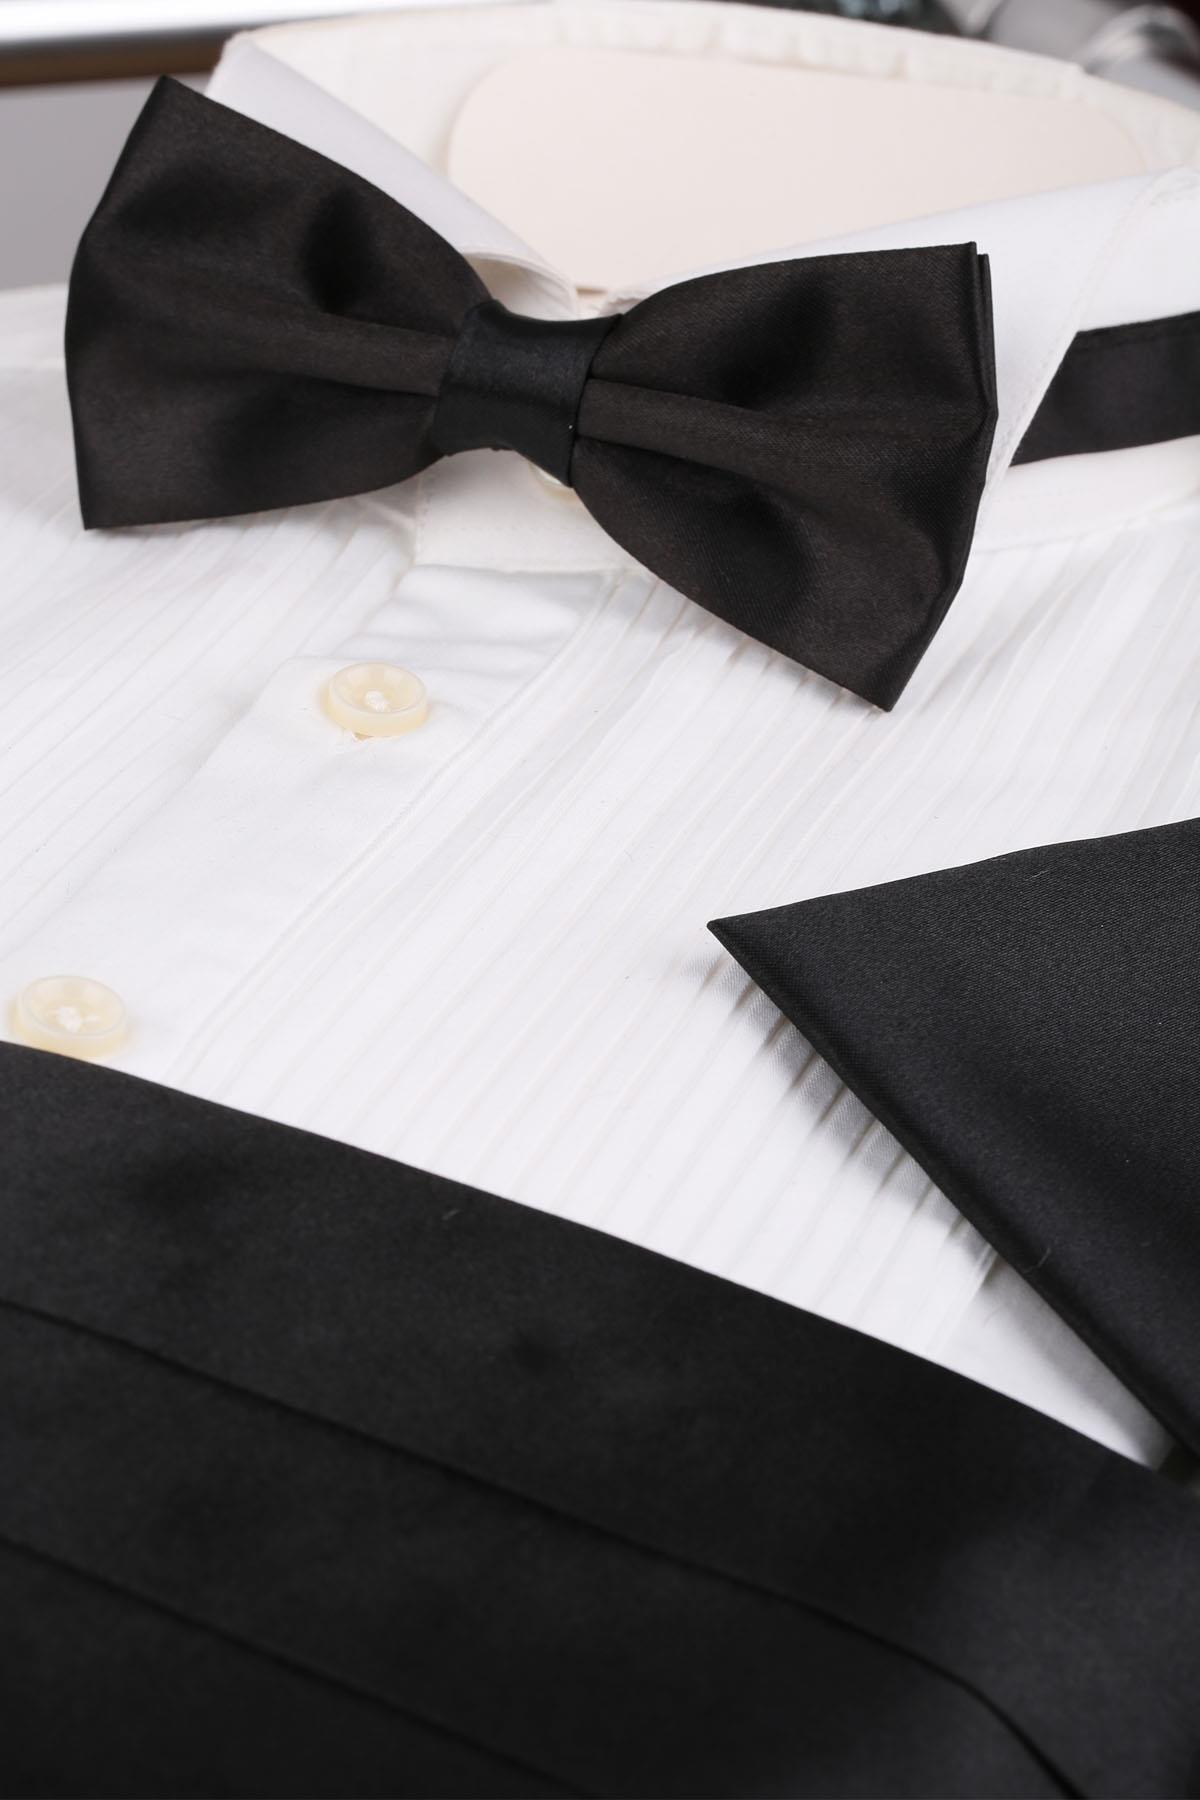 La Pescara Siyah Papyon Kuşak - Damatlık Smokin Kemeri Smk50 2